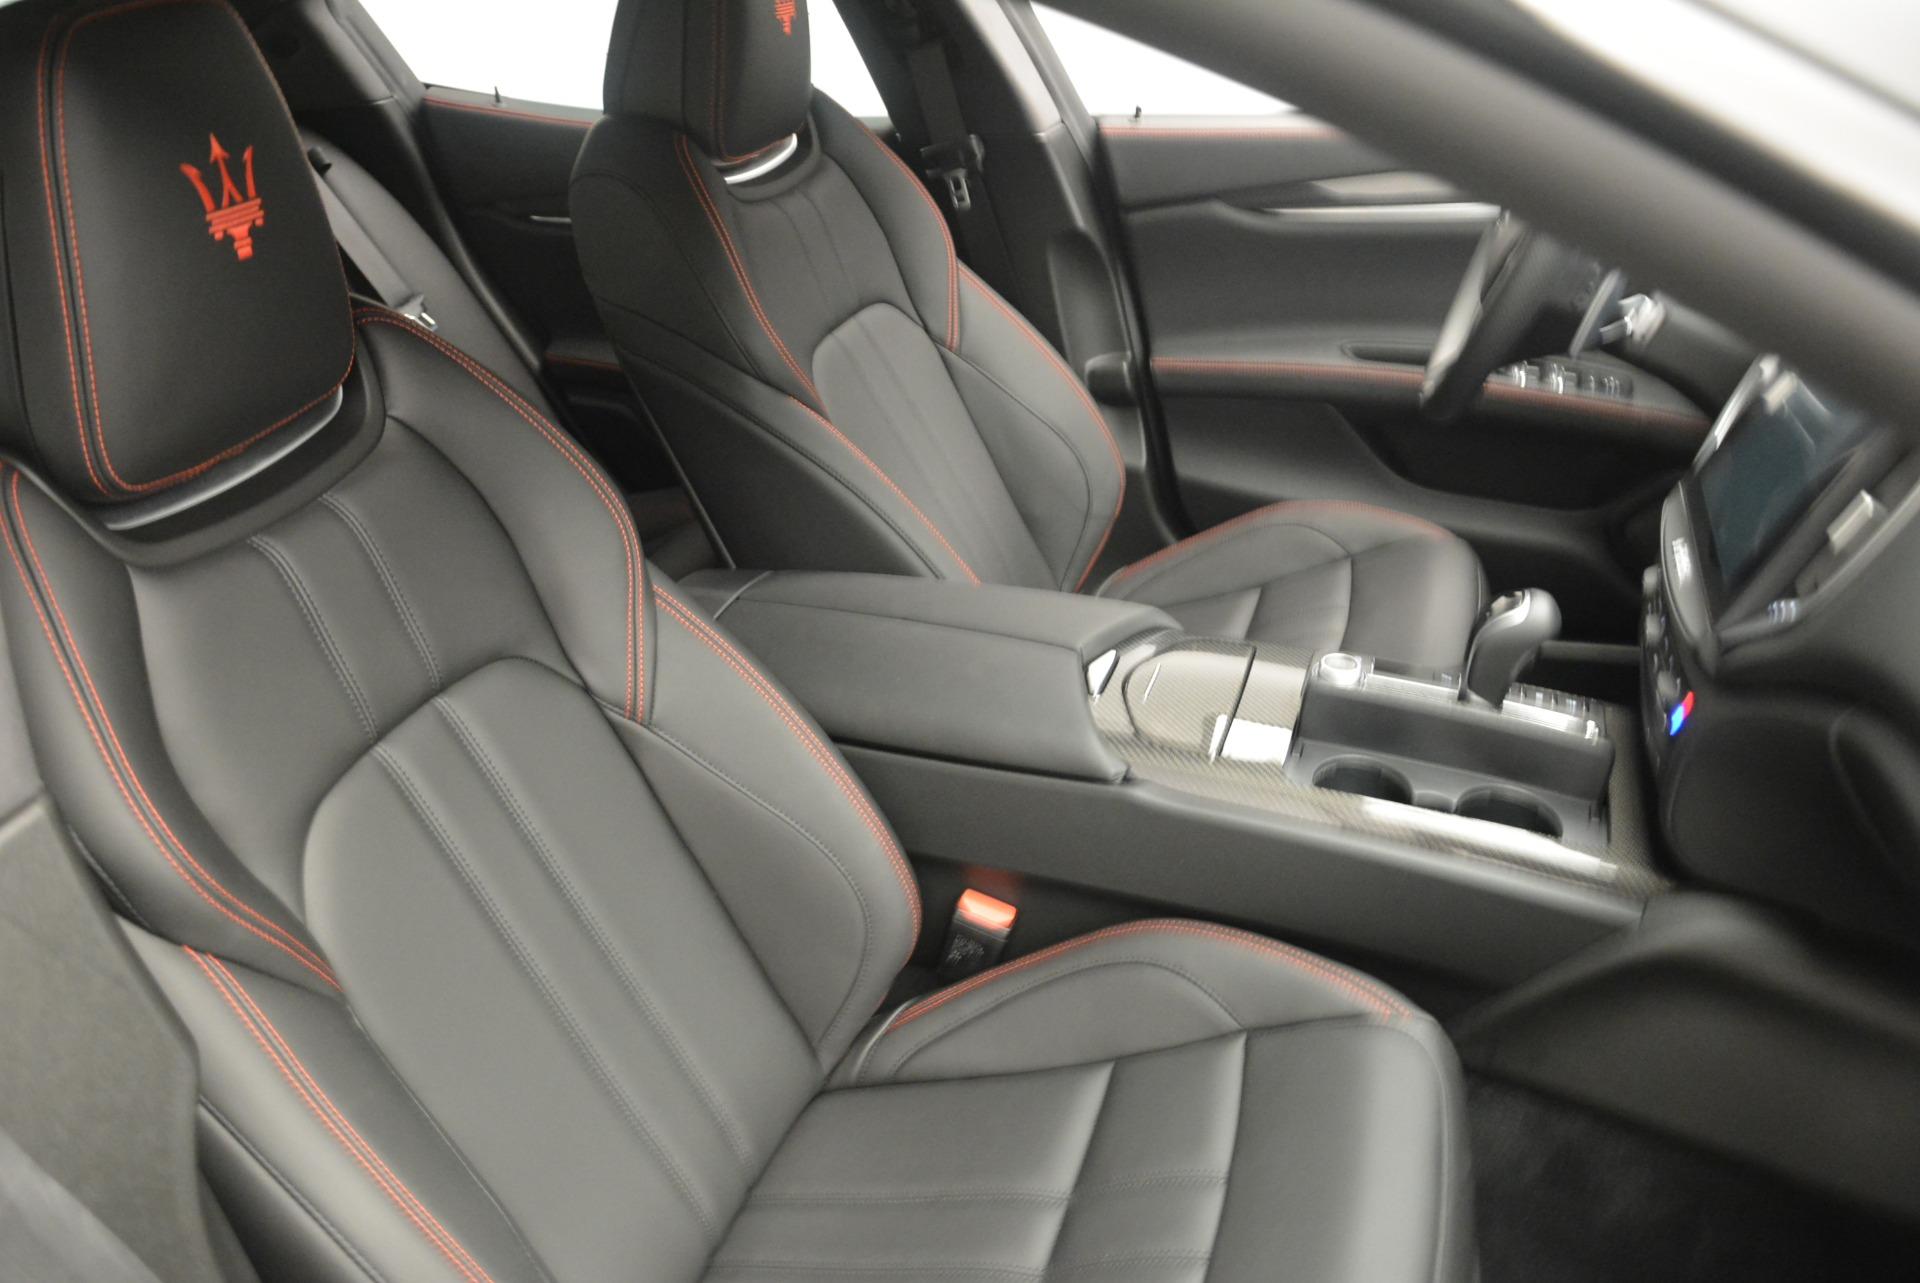 New 2018 Maserati Ghibli SQ4 GranSport Nerissimo For Sale In Westport, CT 2372_p20